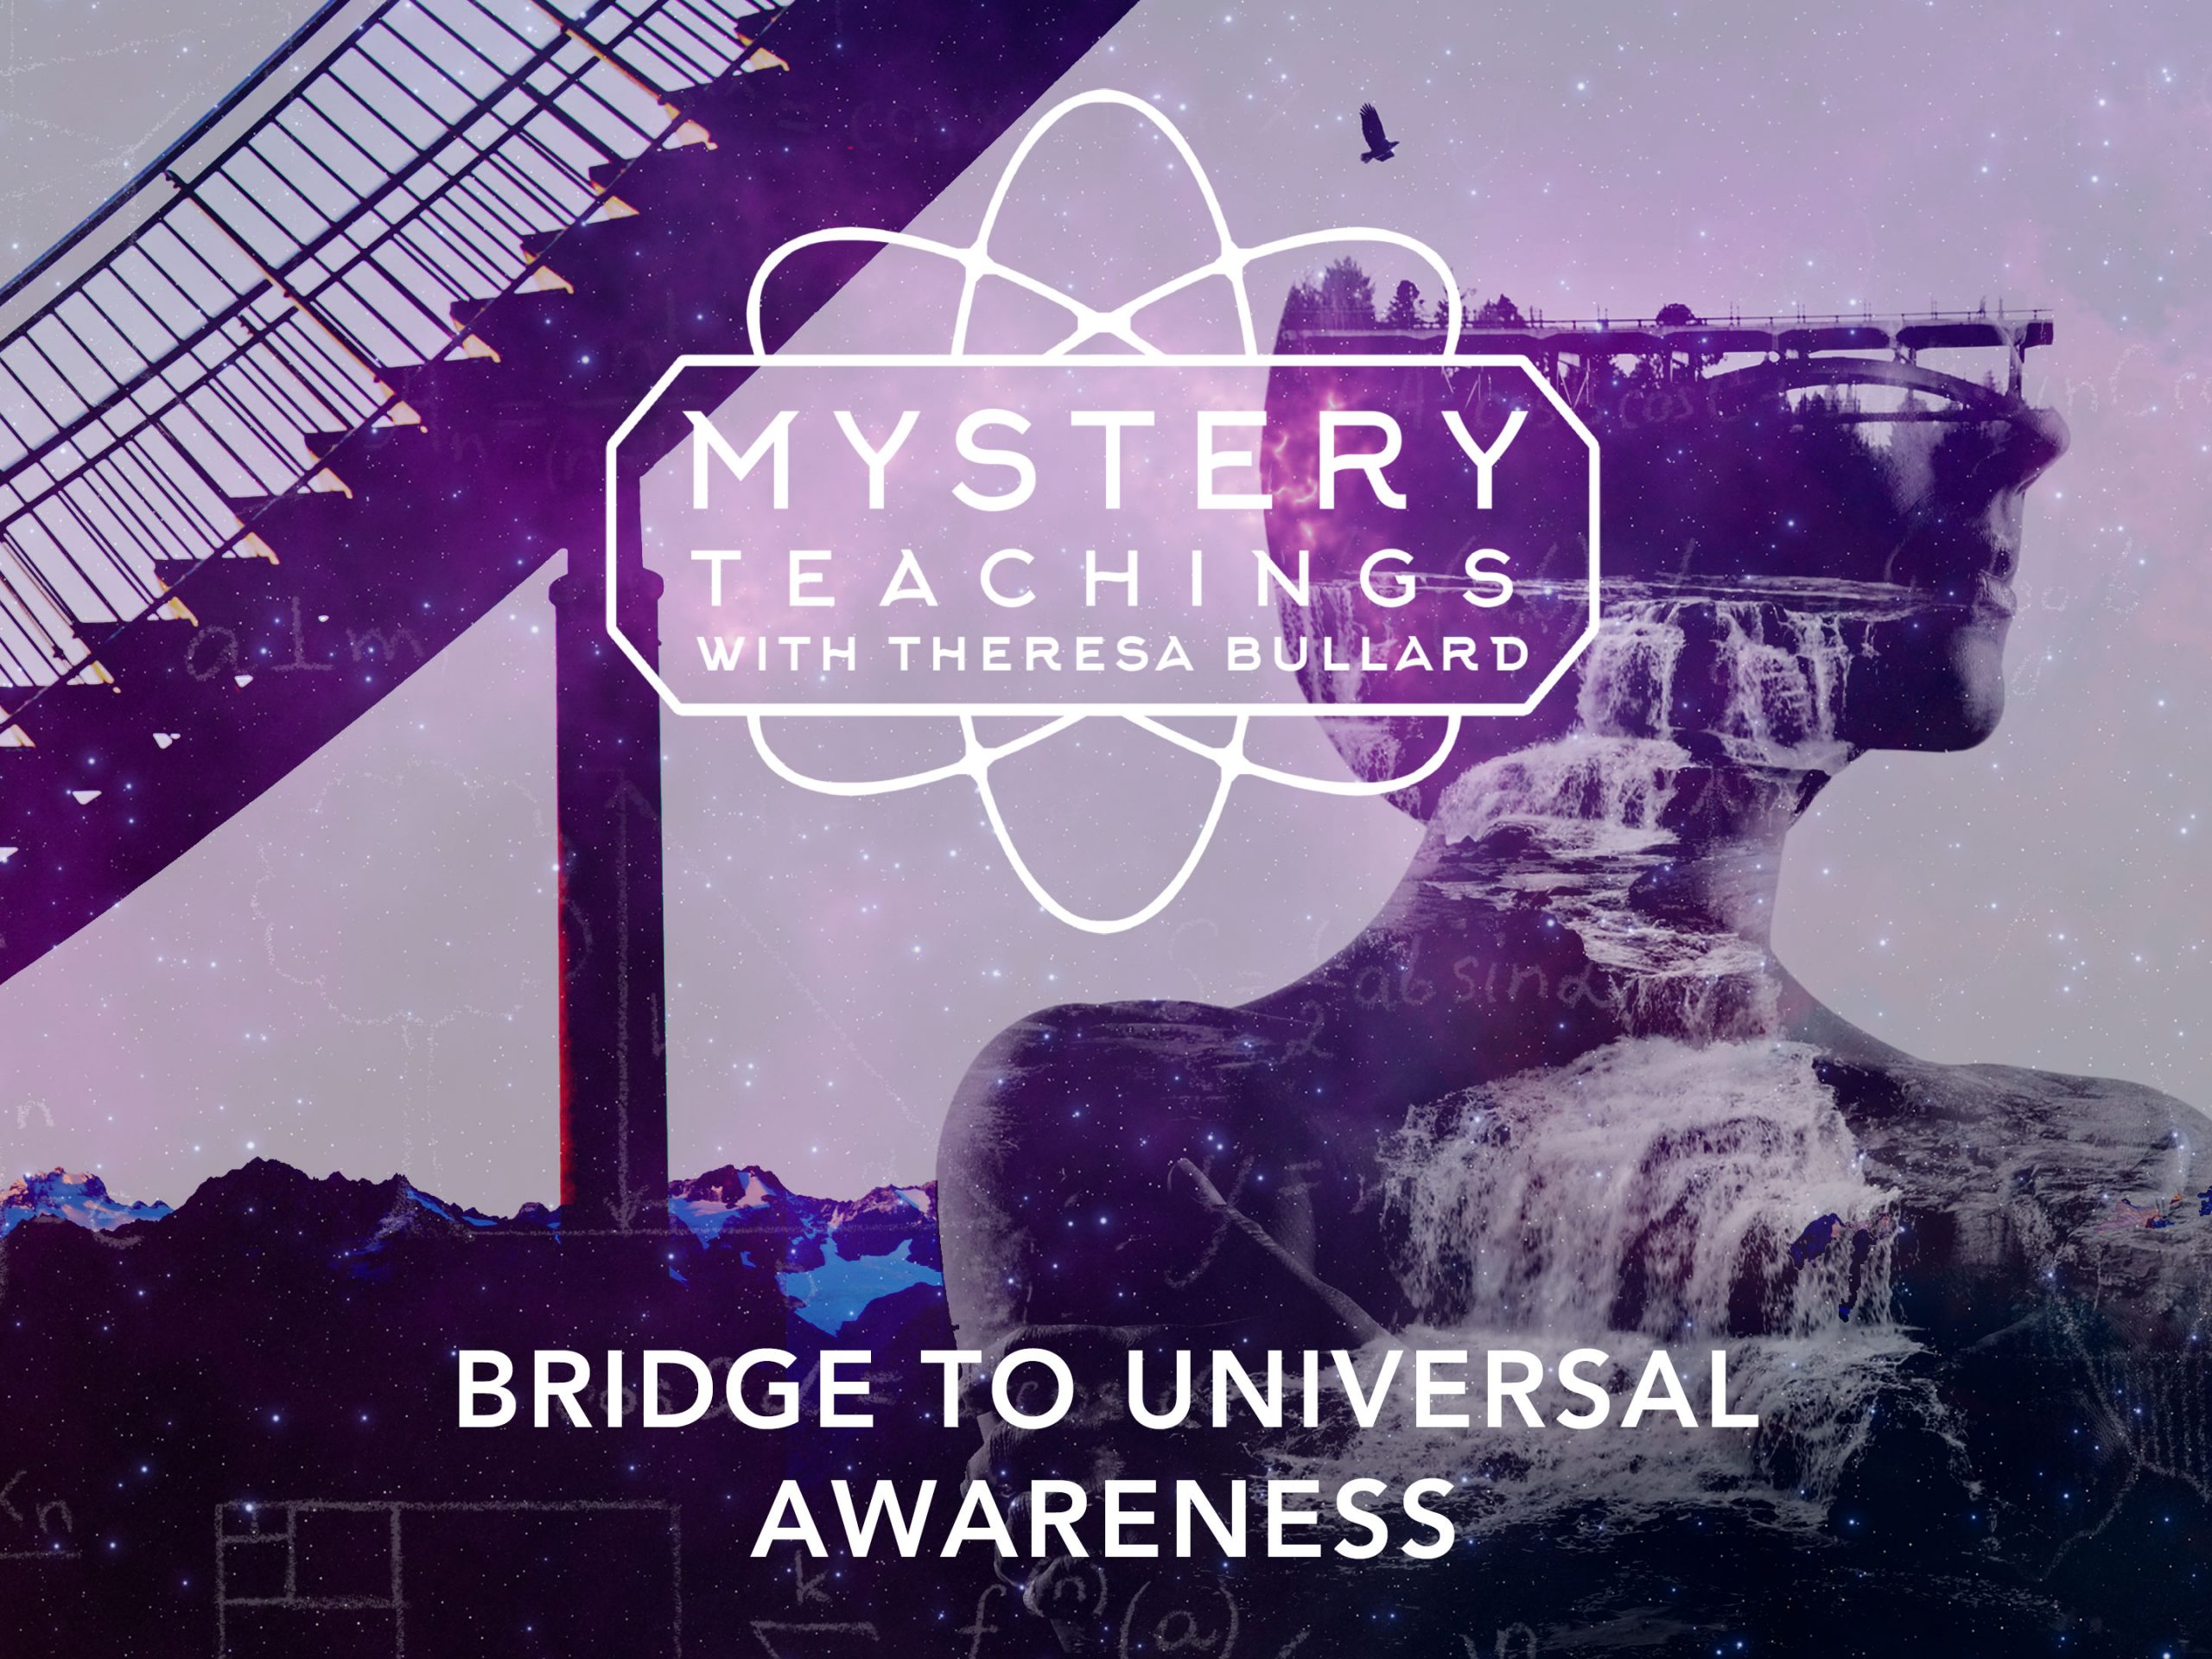 183107_MT_s2e8_Bridge-to-Universal-Awareness_4x3